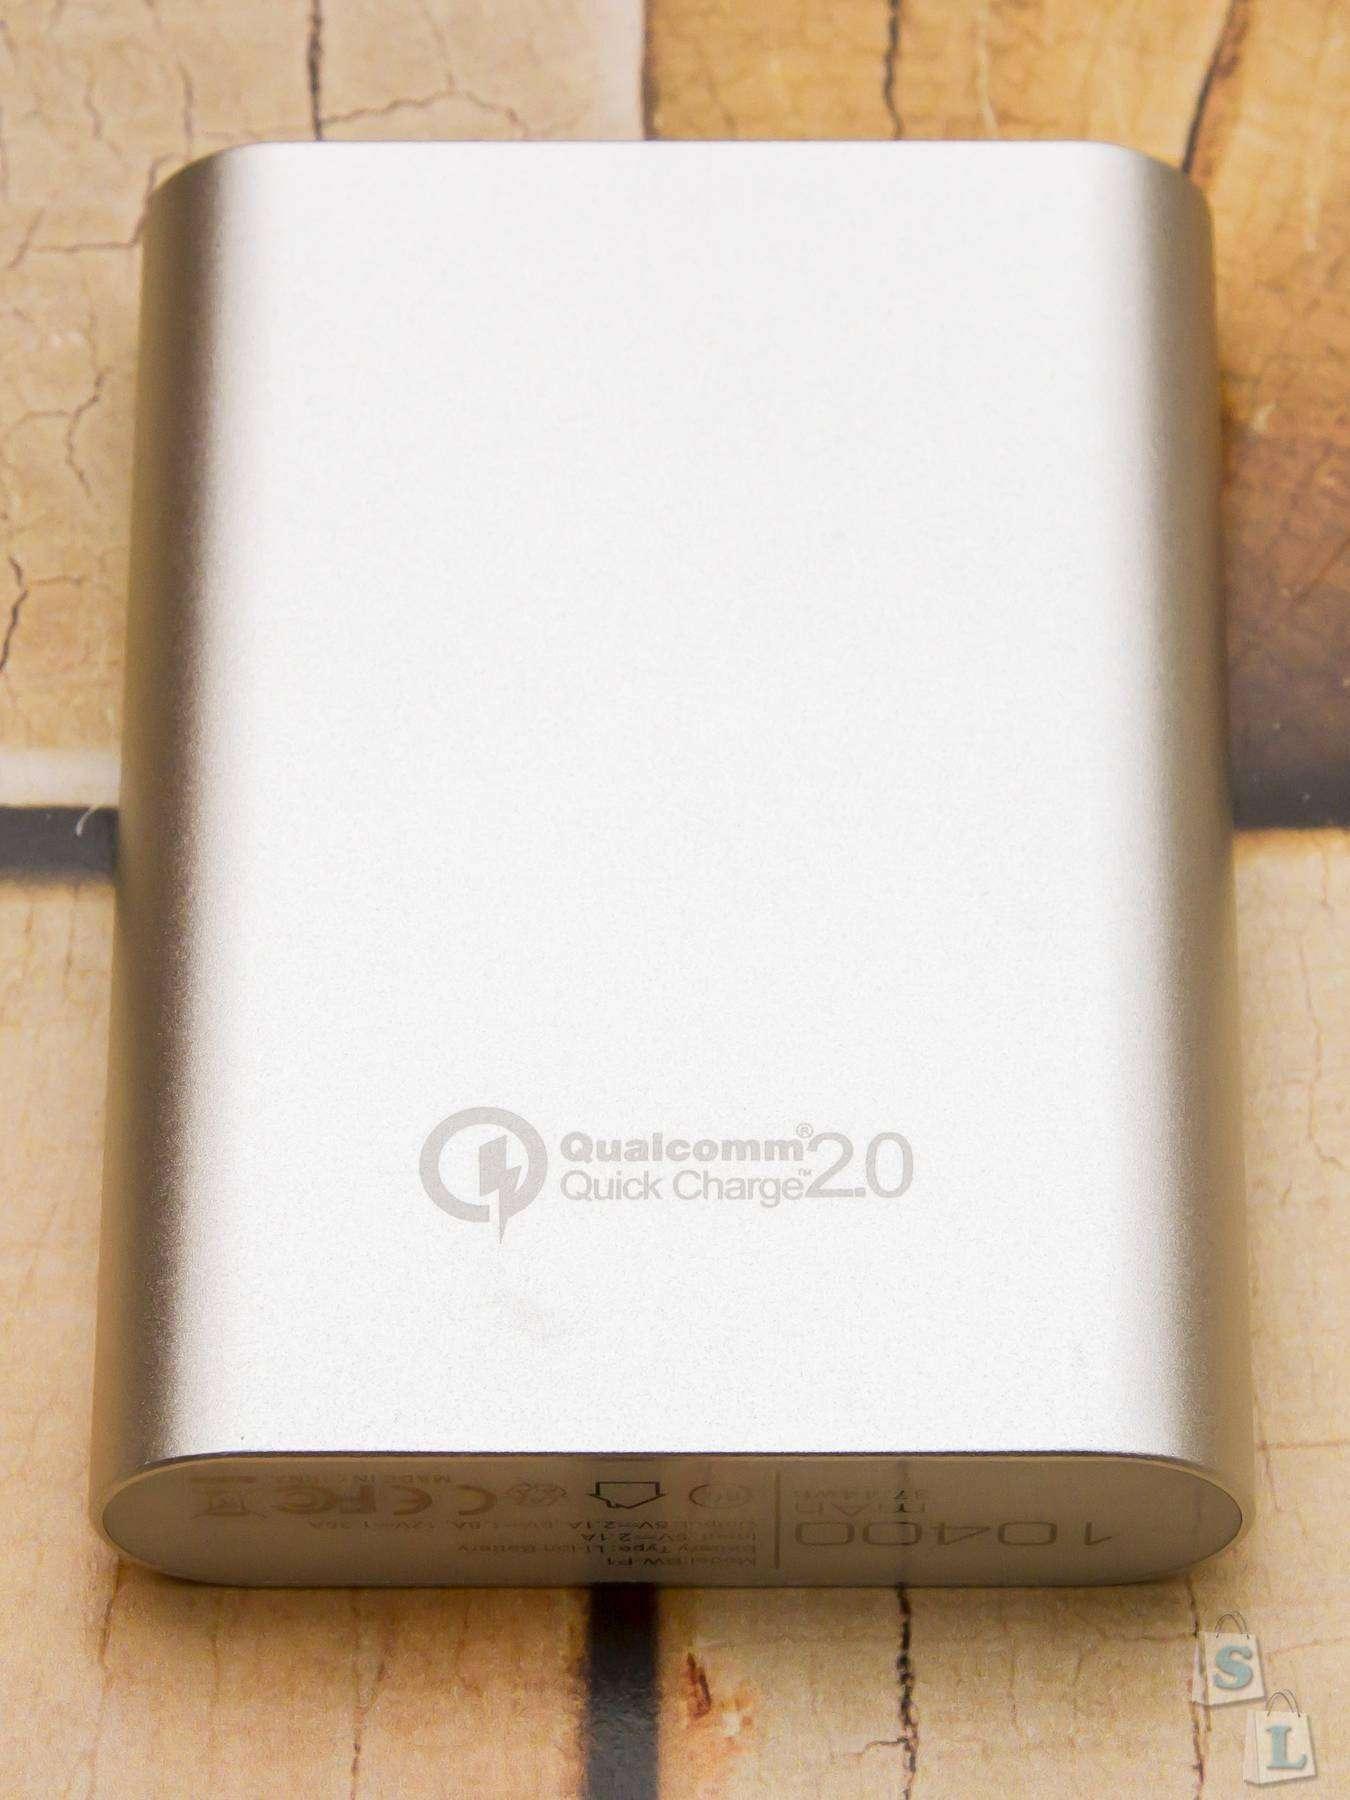 Banggood: Повербанк BlitzWolf 10400mAh с поддержкой технологии Quick Charge 2.0